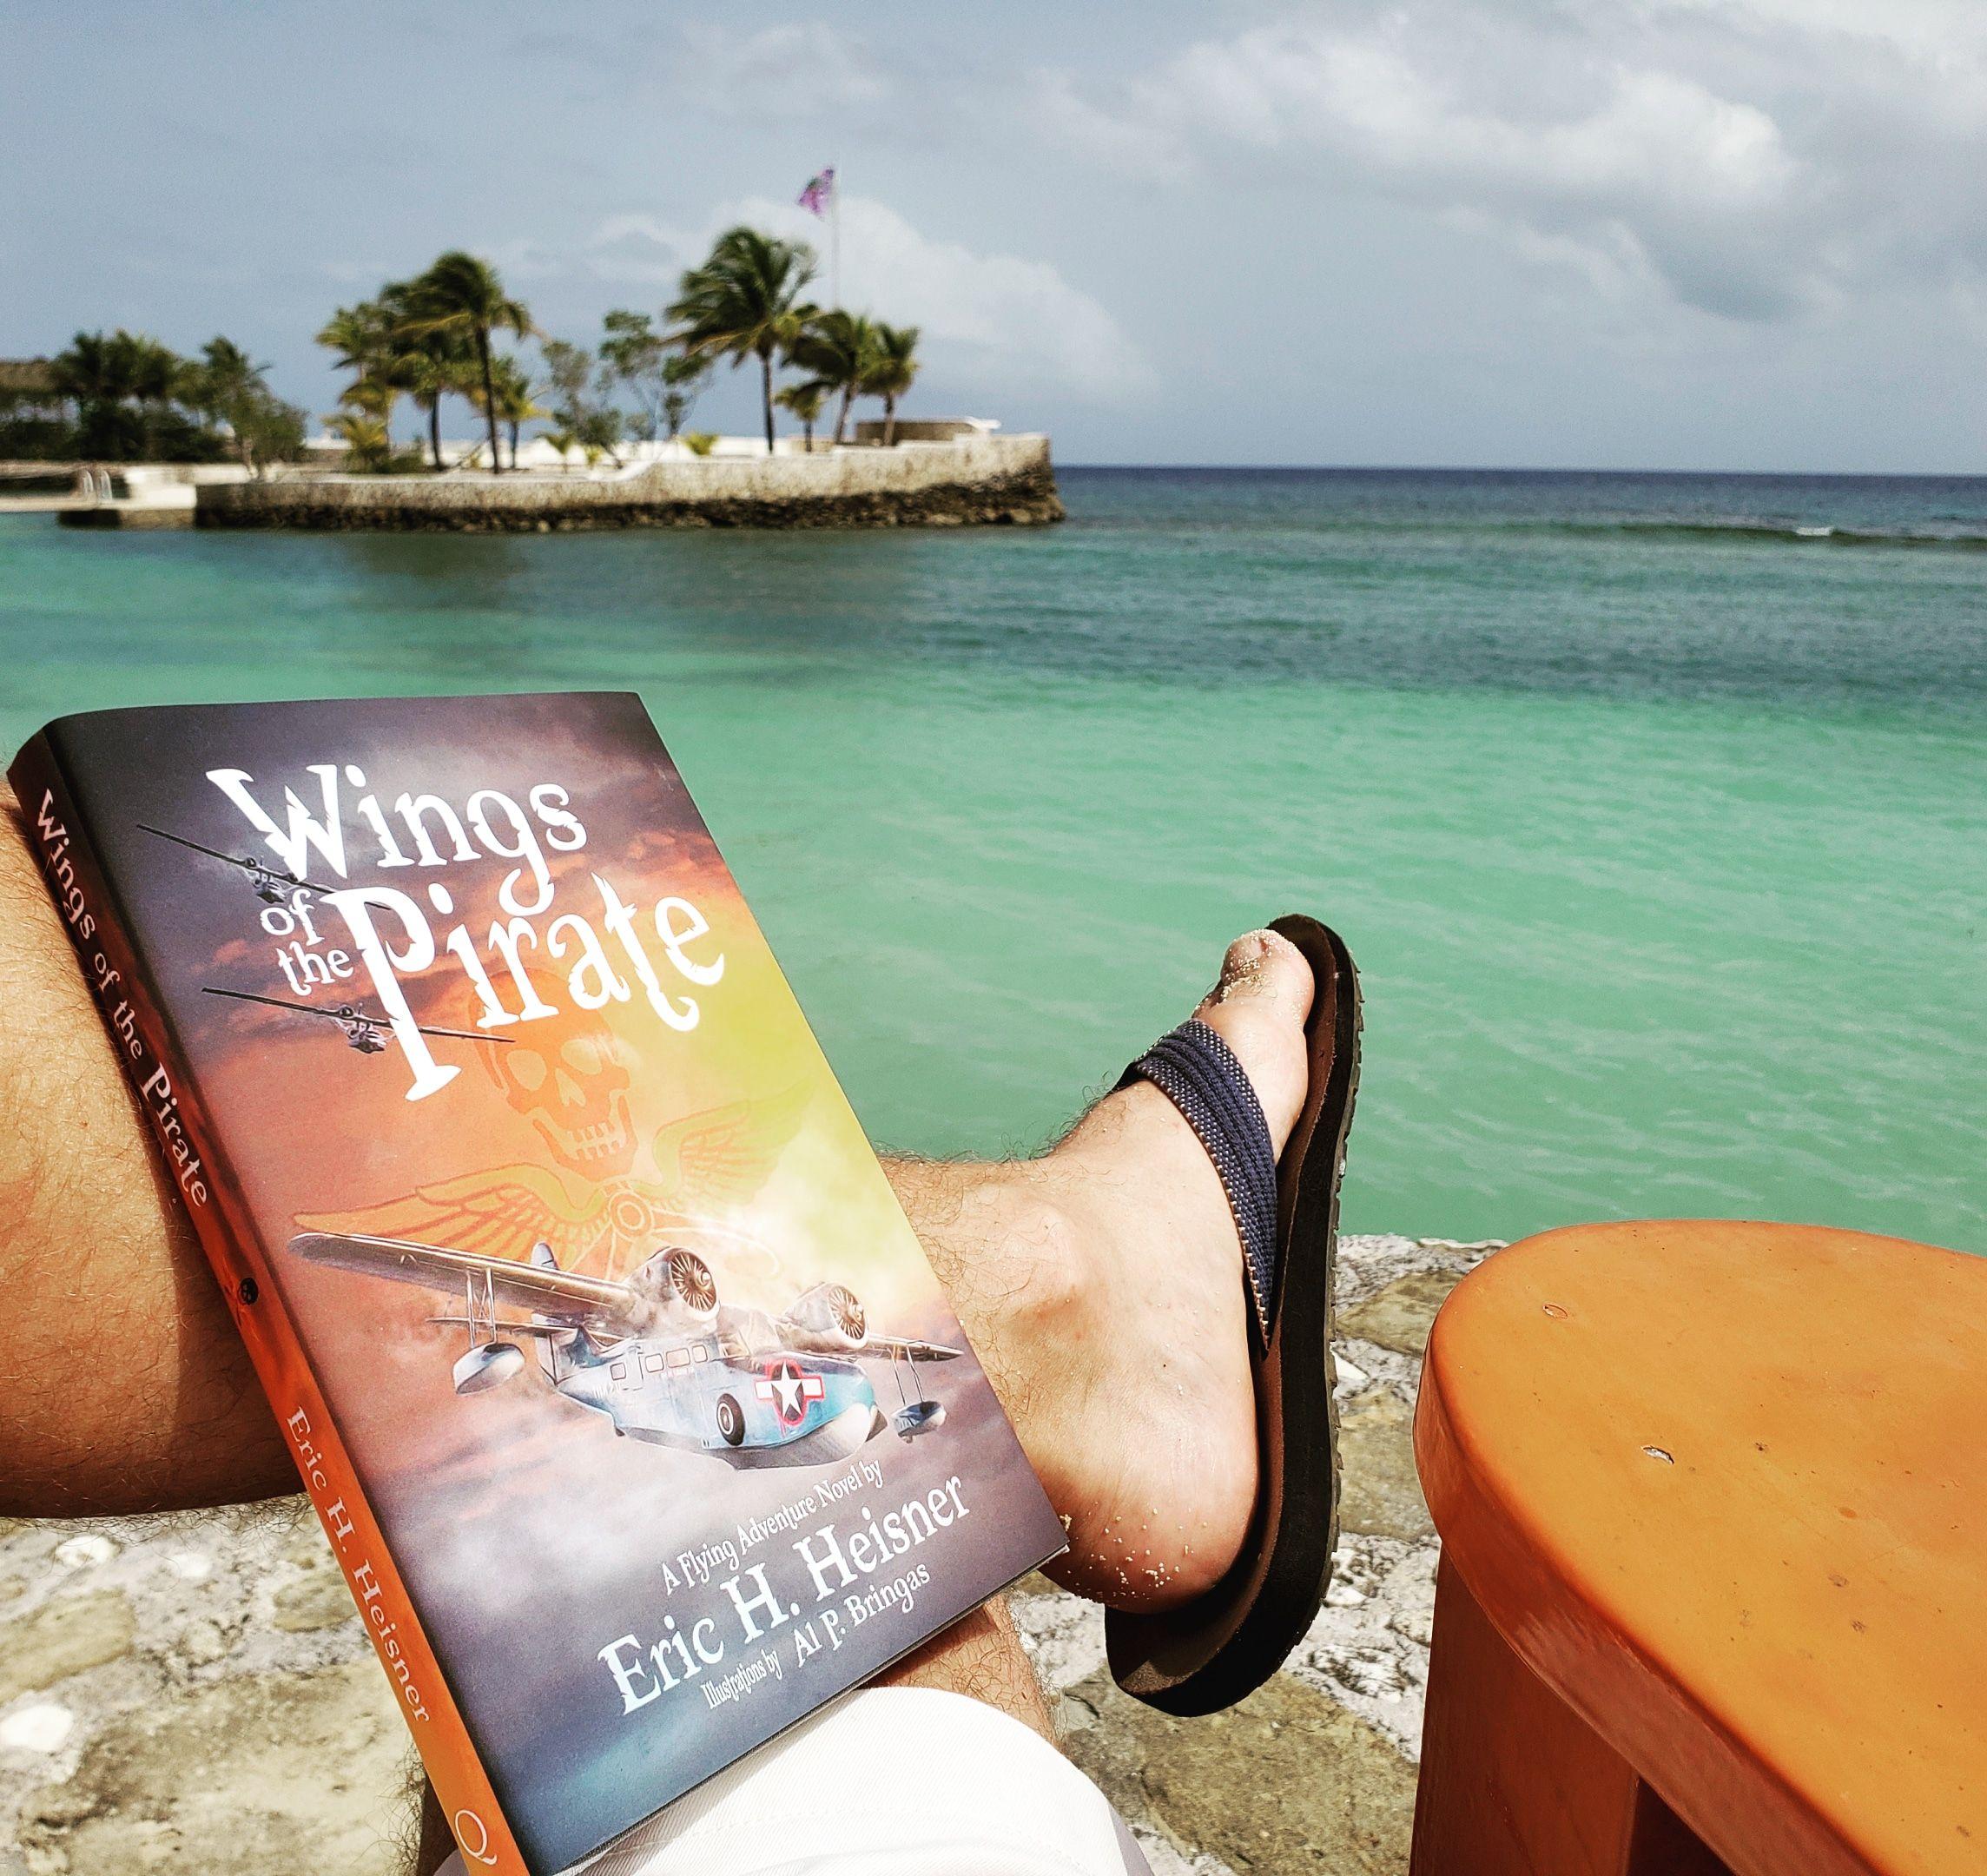 South Seas Adventure Novel For Summer Reading A Female Indiana Jones Hires A Rascally Seaplane Pilot To Adventure Of The Seas Adventure Novels Summer Reading